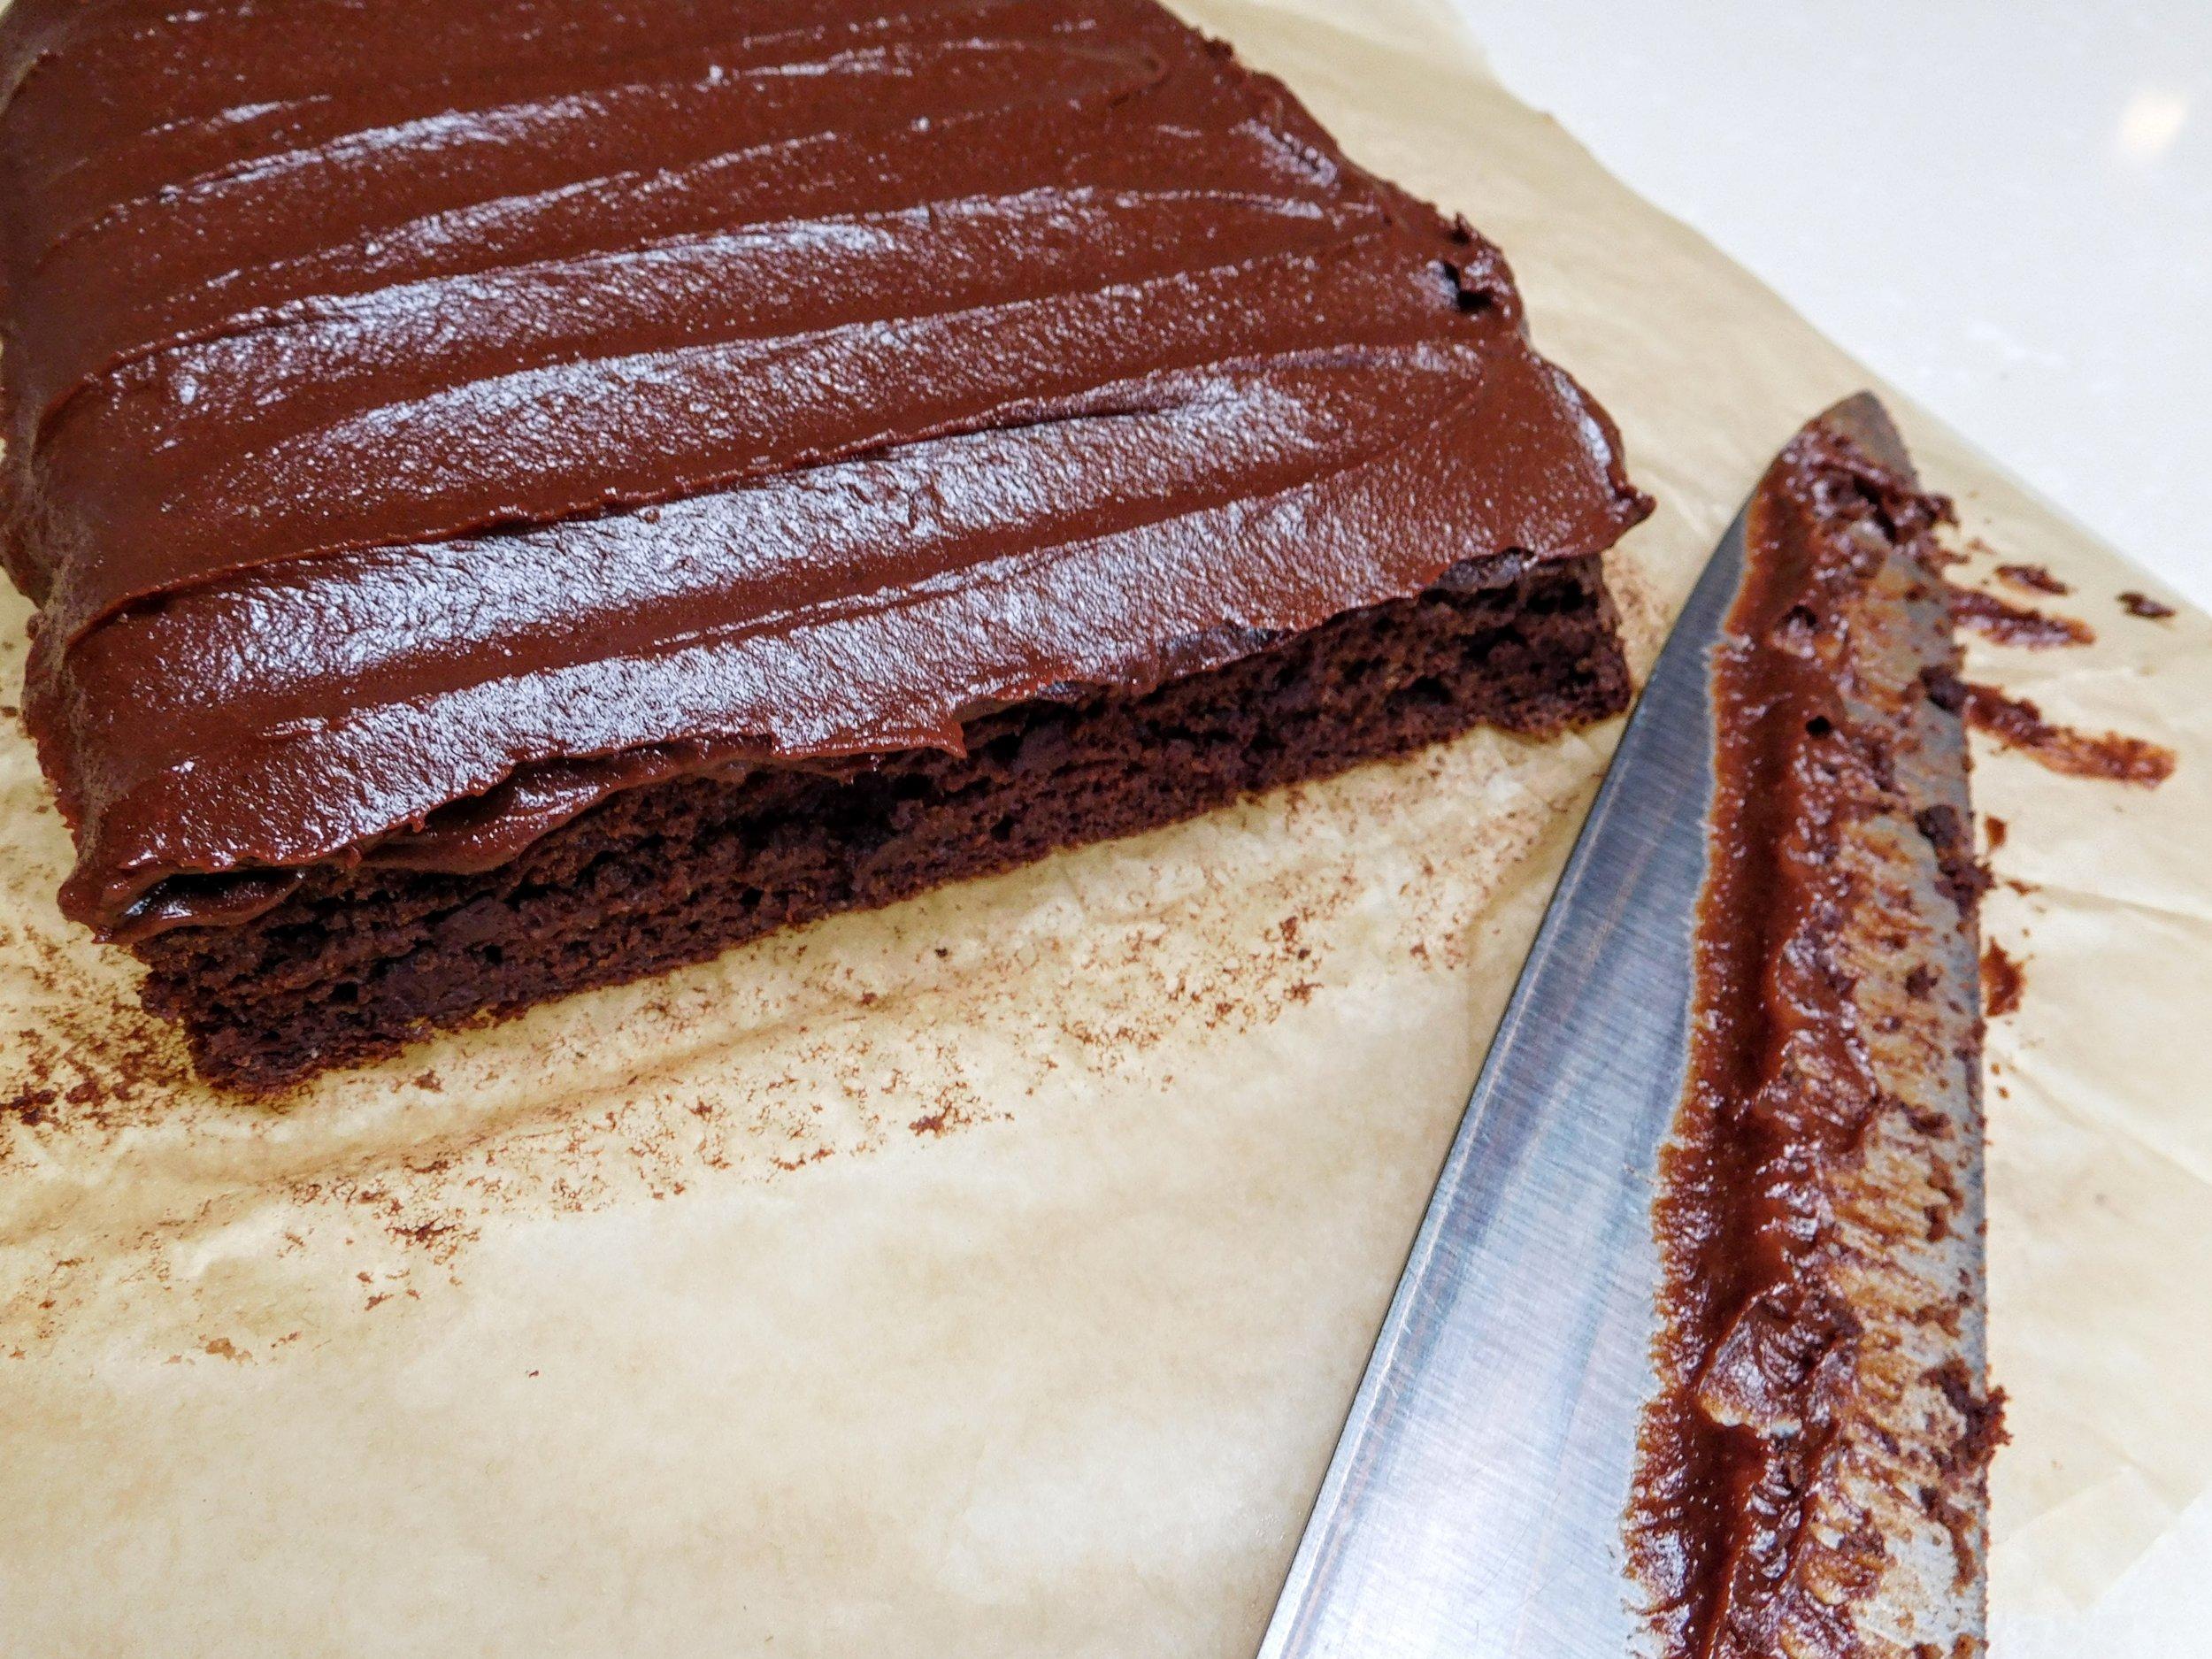 cho sweet pot cake whole.JPG